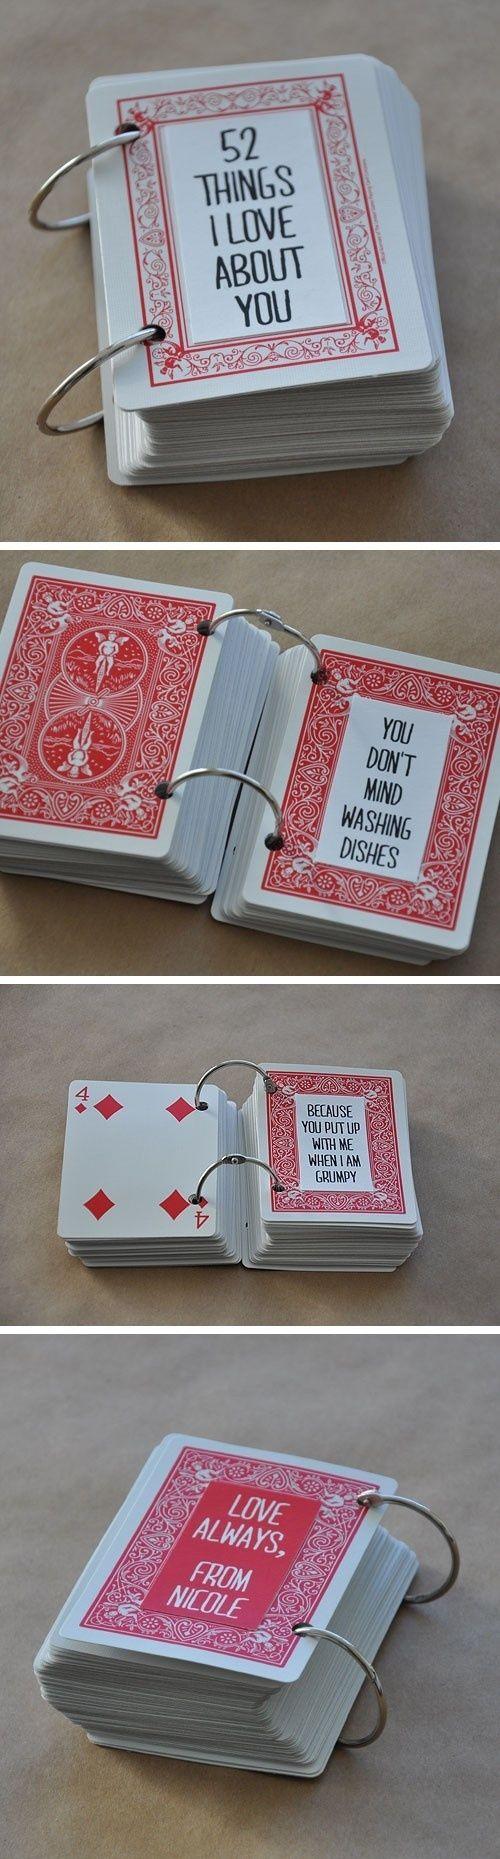 Cute husband/boyfriend DIY gift for wedding, valentines, birthday, just because...